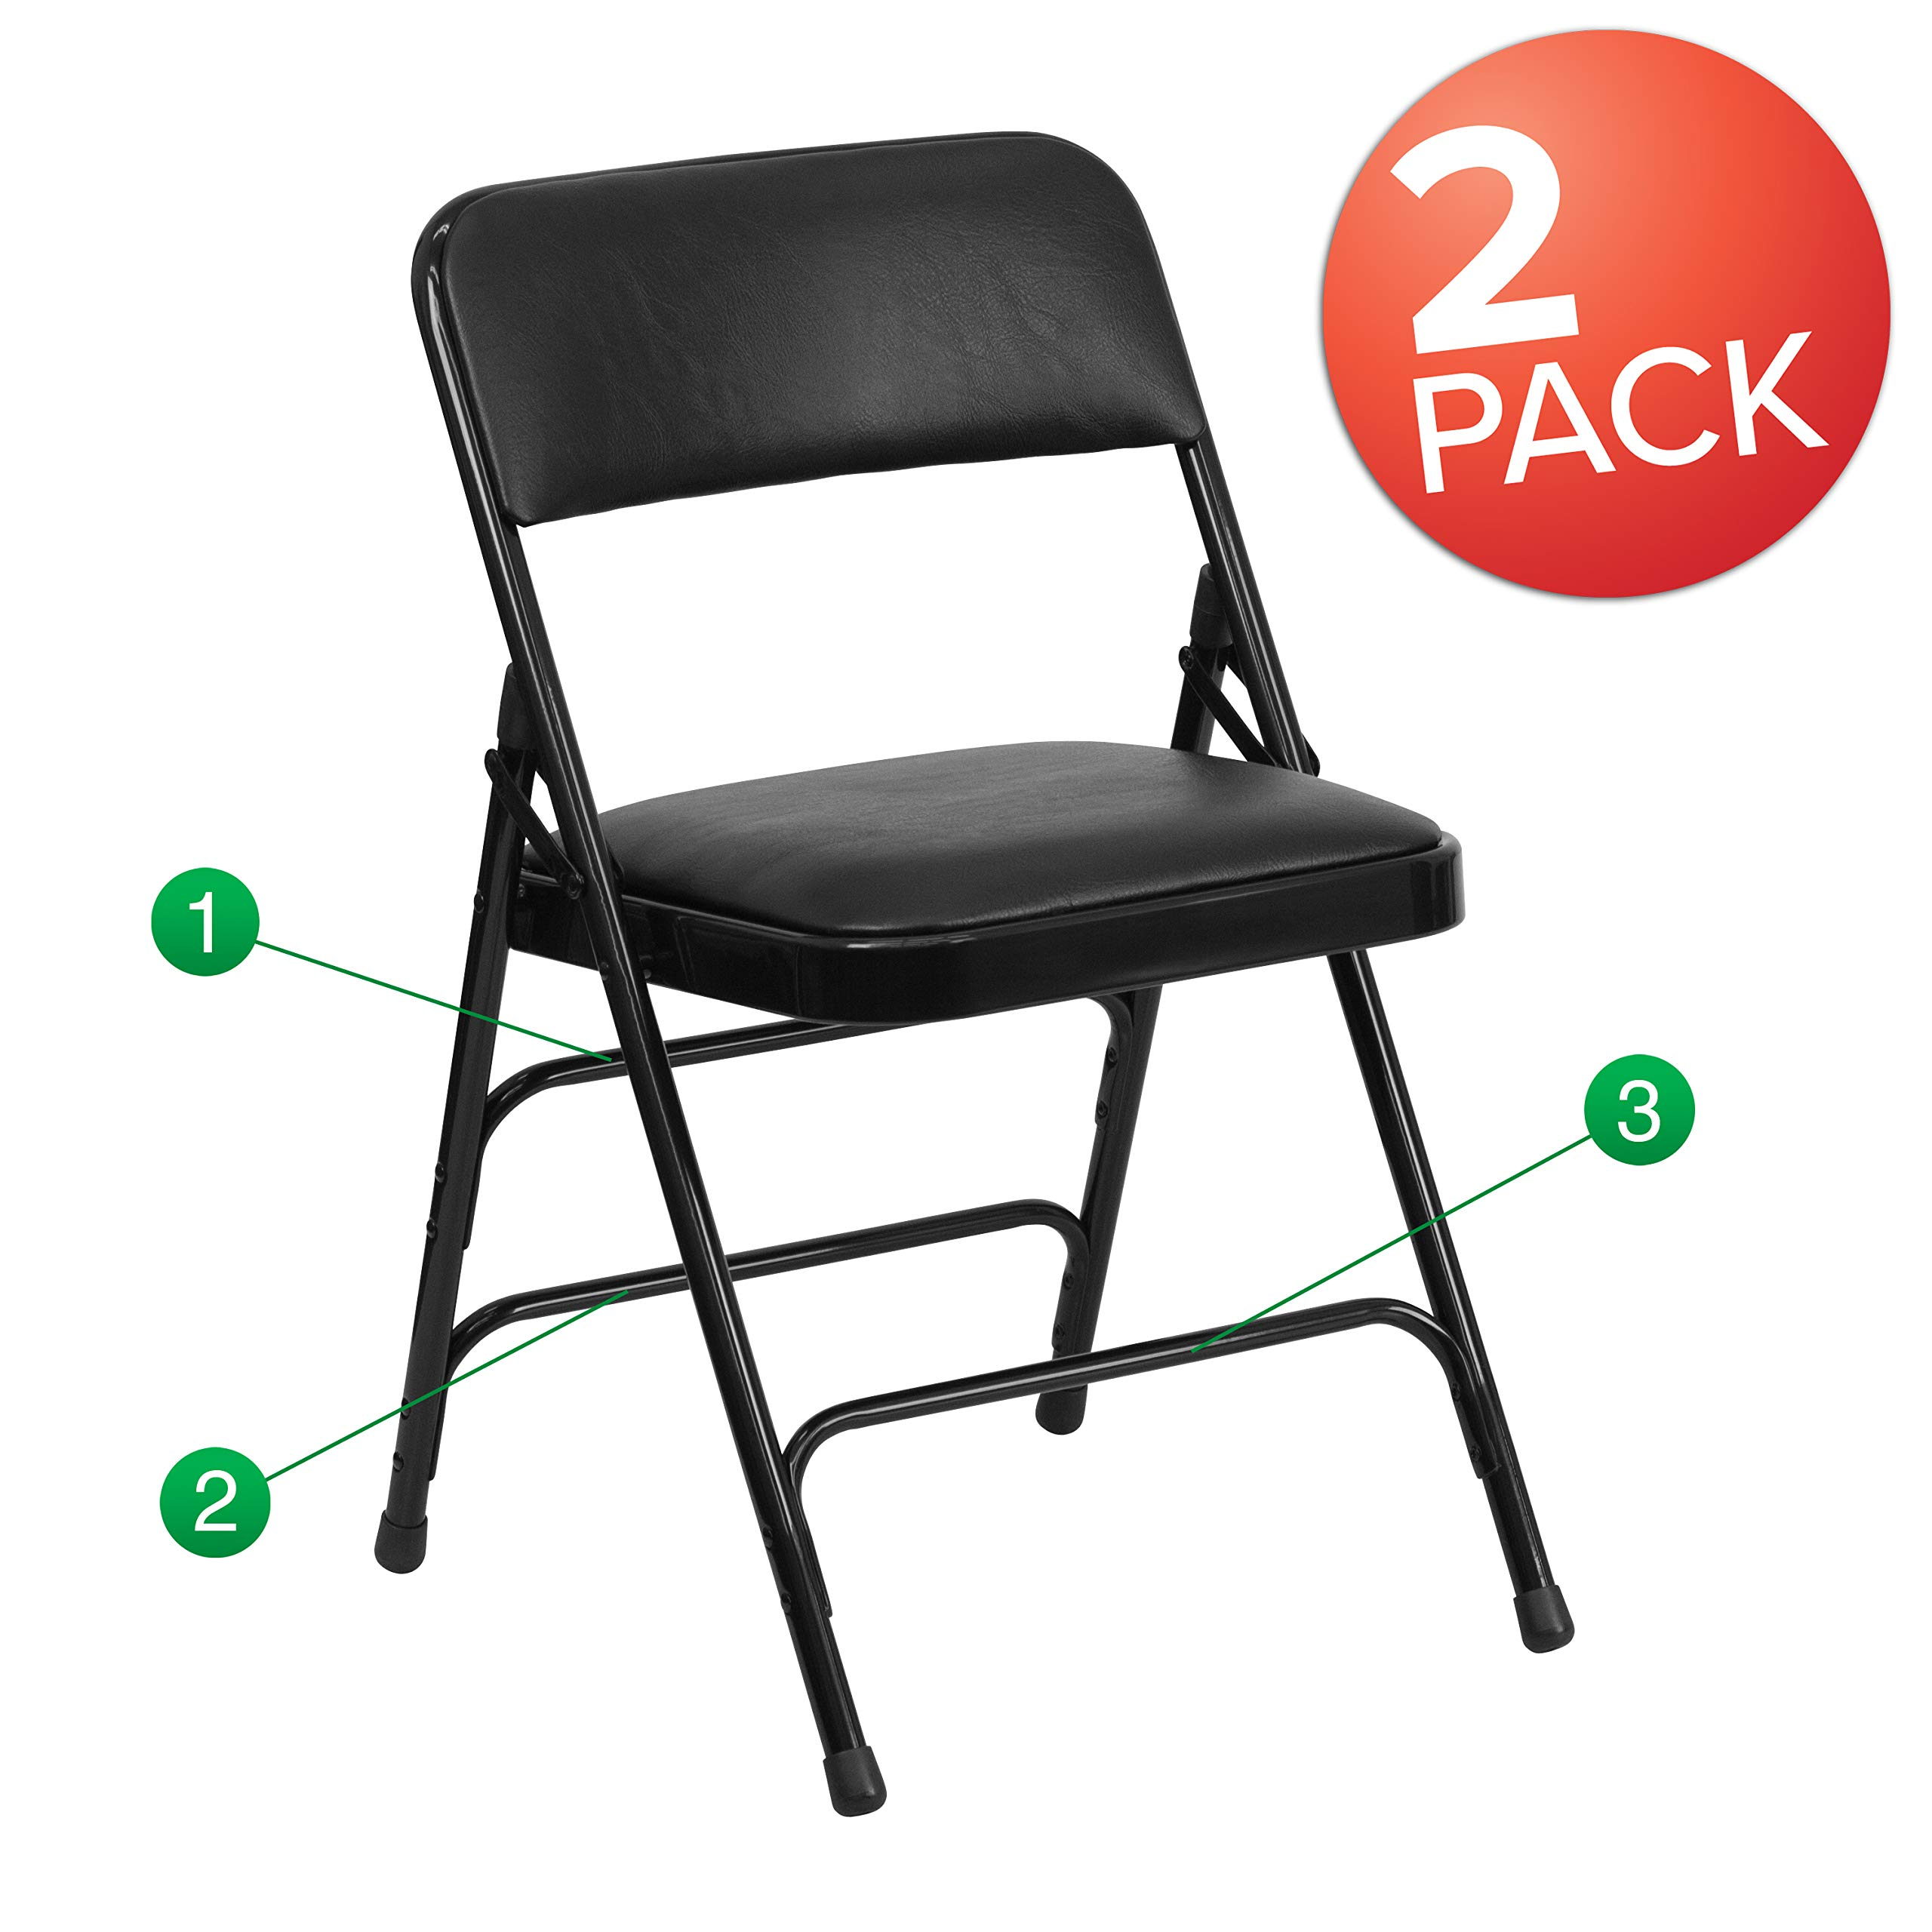 Flash Furniture HERCULES Series Metal Folding Chairs with Padded Seats   Set of 2 Black Metal Folding Chairs by Flash Furniture